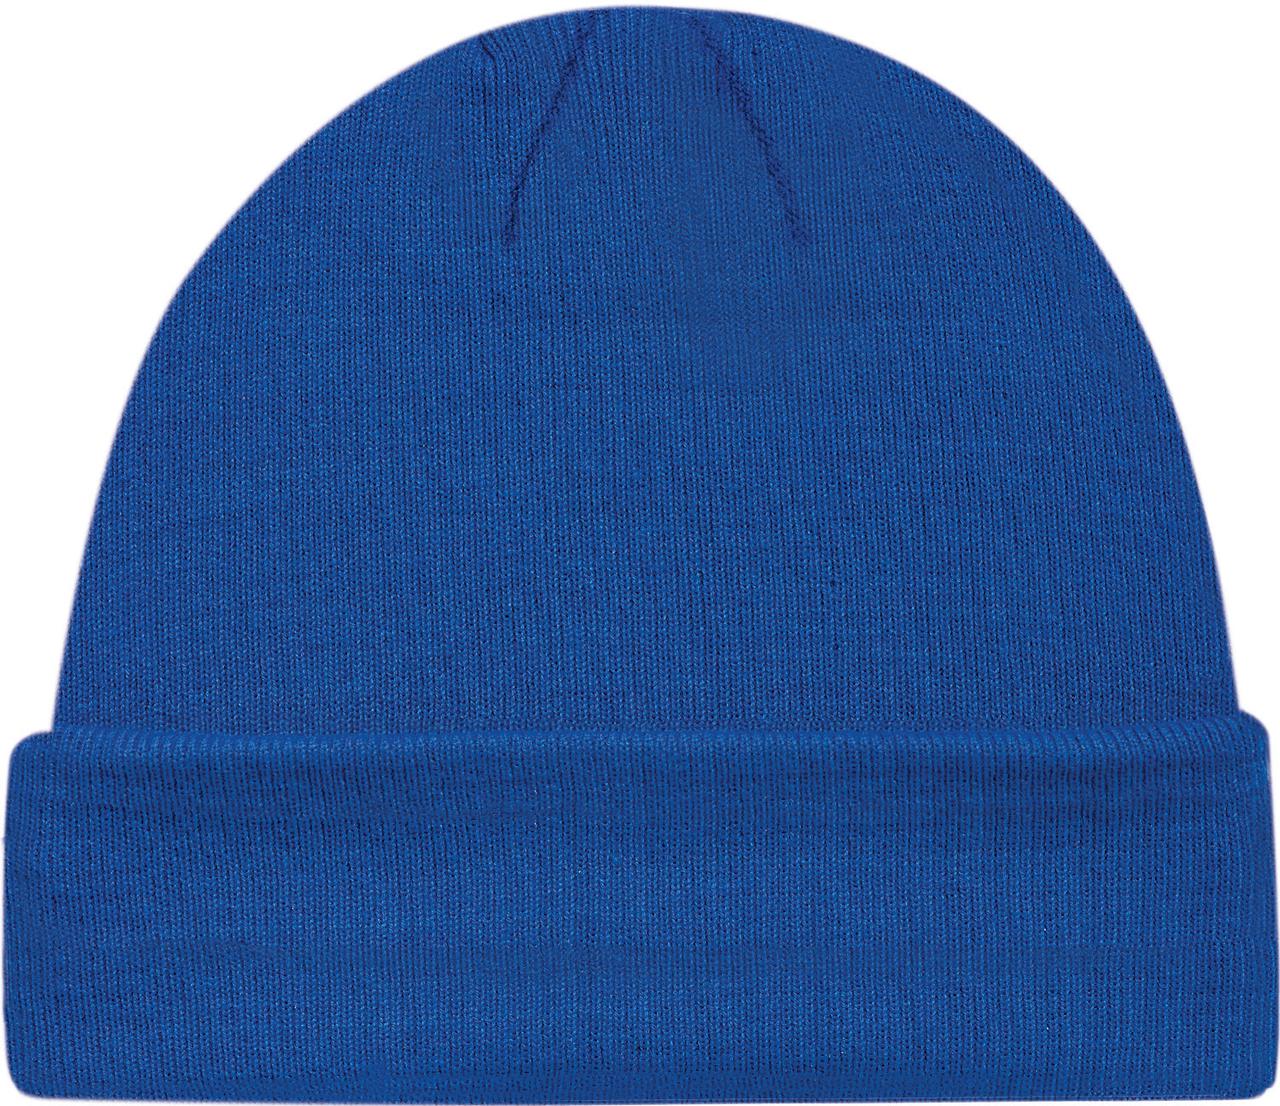 1J530M Acrylic Polyester Micro Fleece Cuff Toque - Hats Caps.ca b5085f7bea8